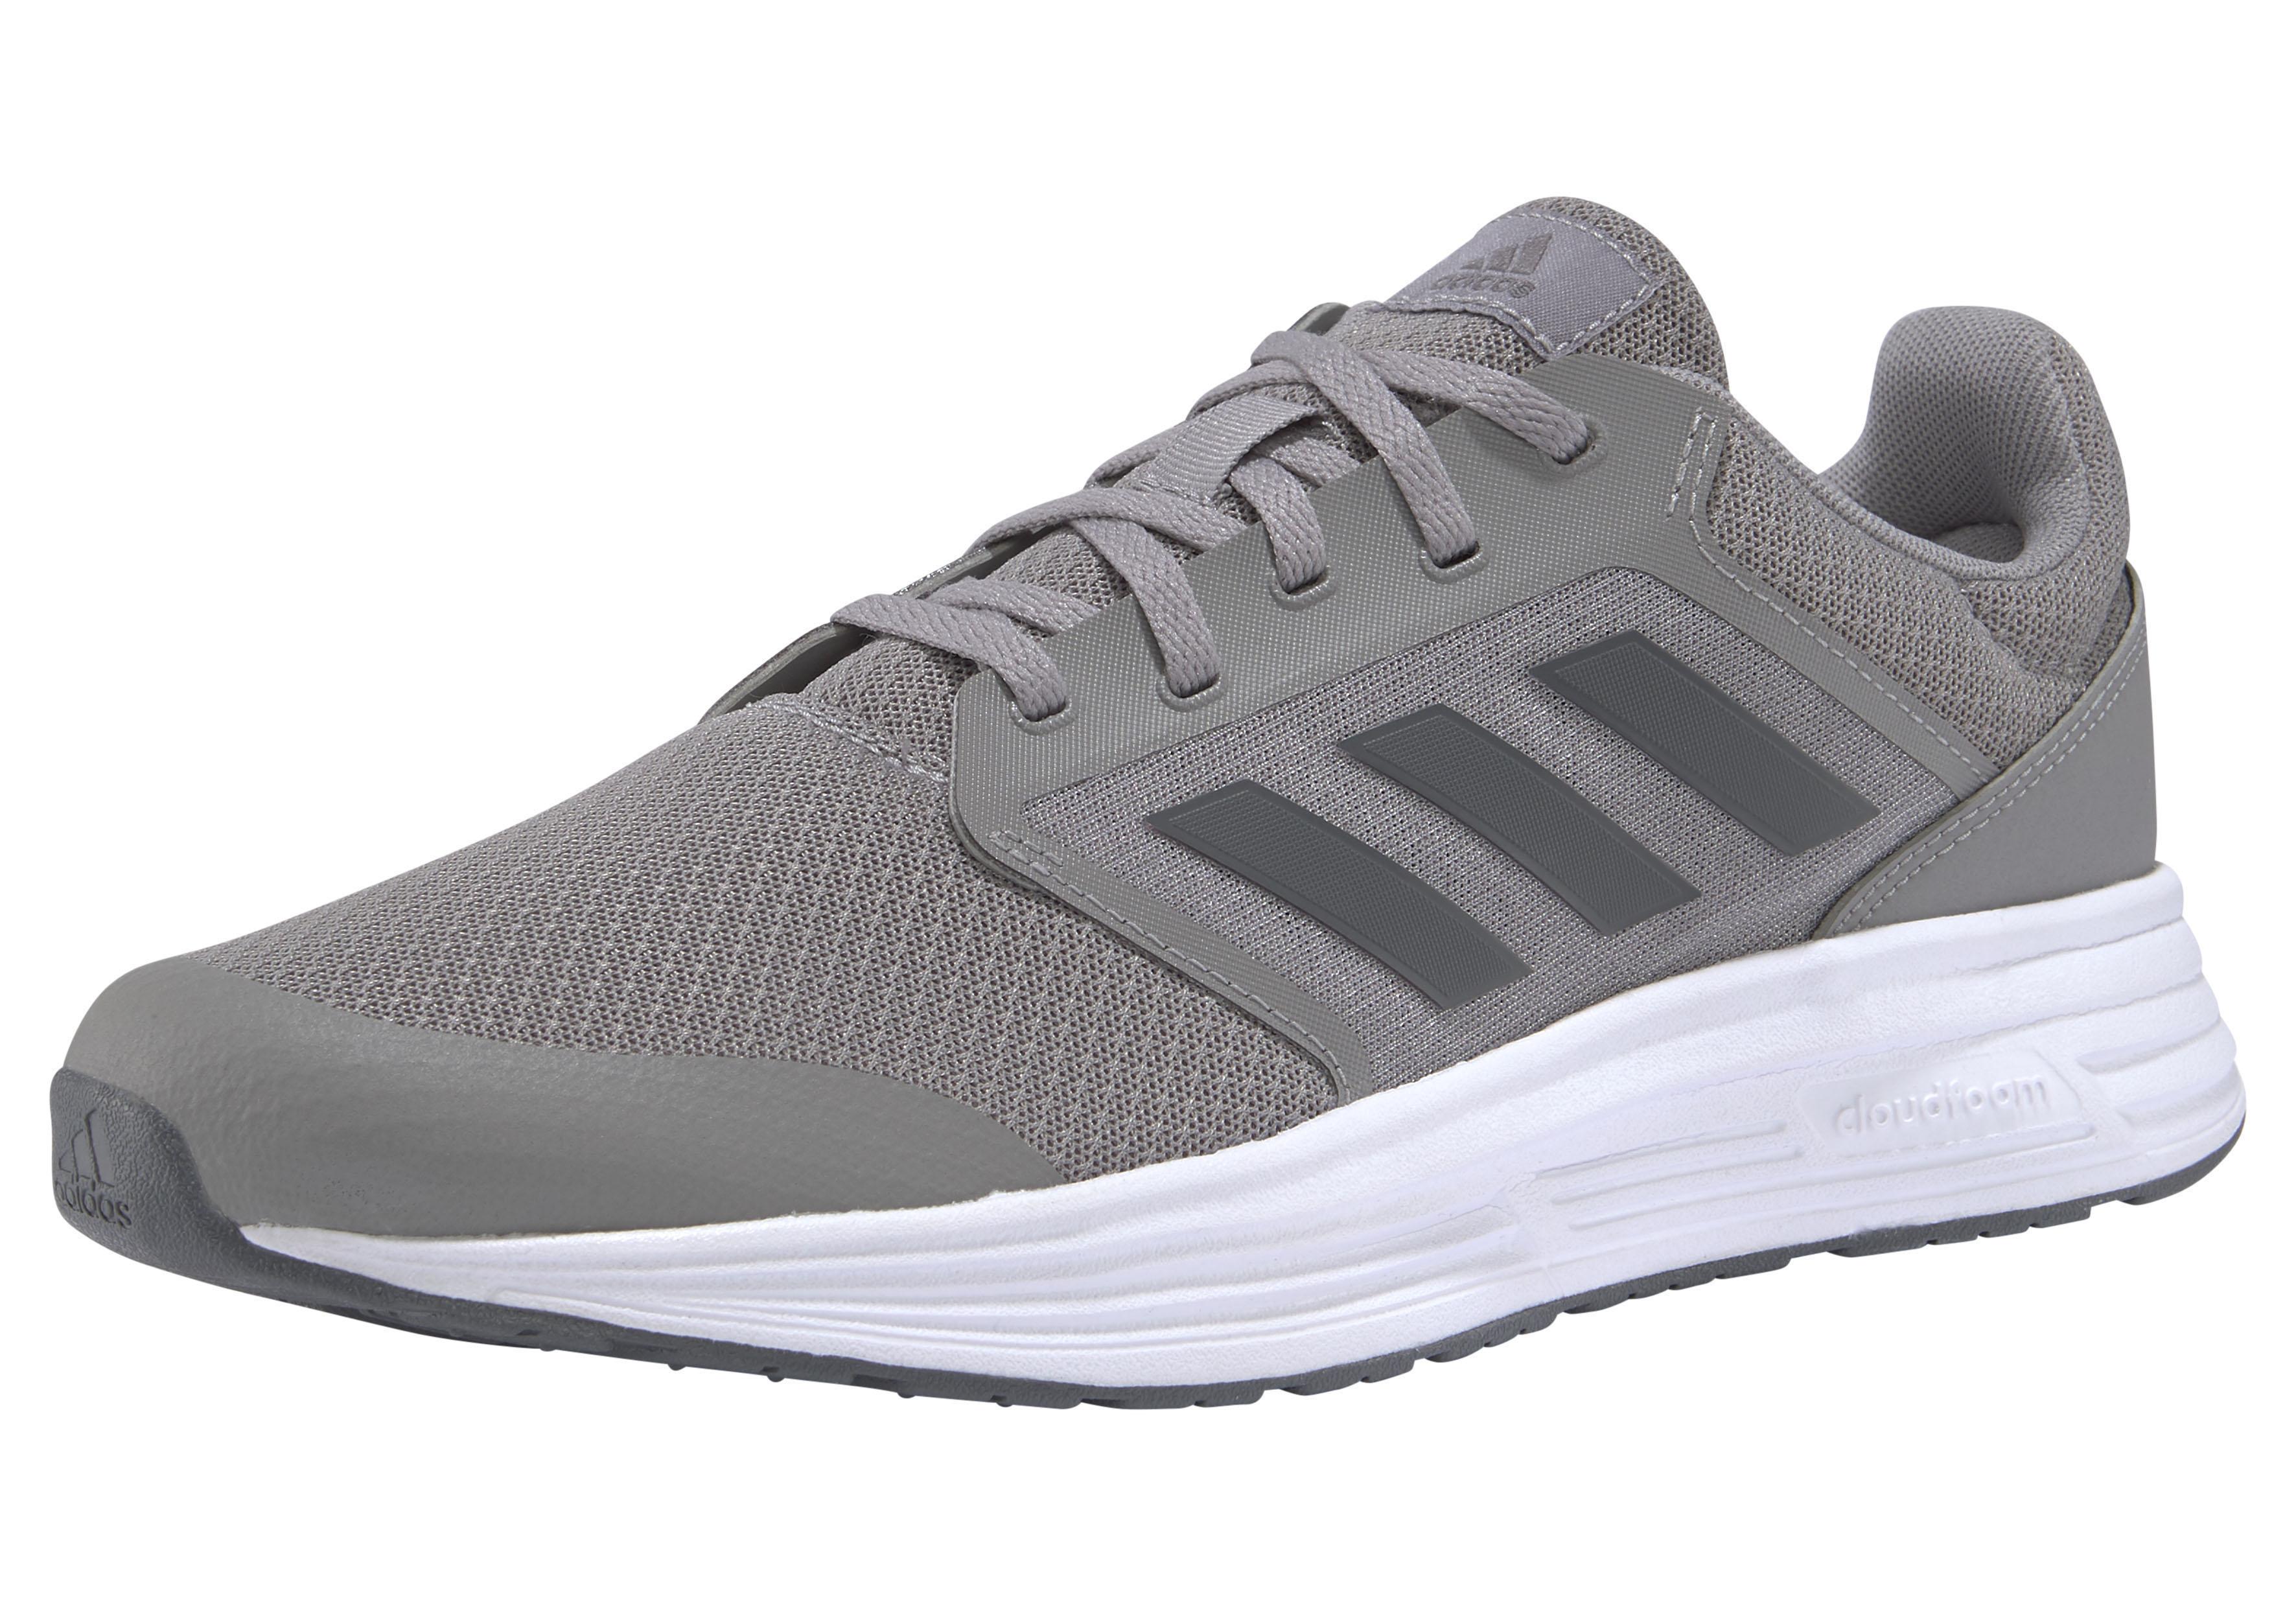 adidas Performance Laufschuh GALAXY 5 grau Laufschuhe Herren Sportschuhe Unisex